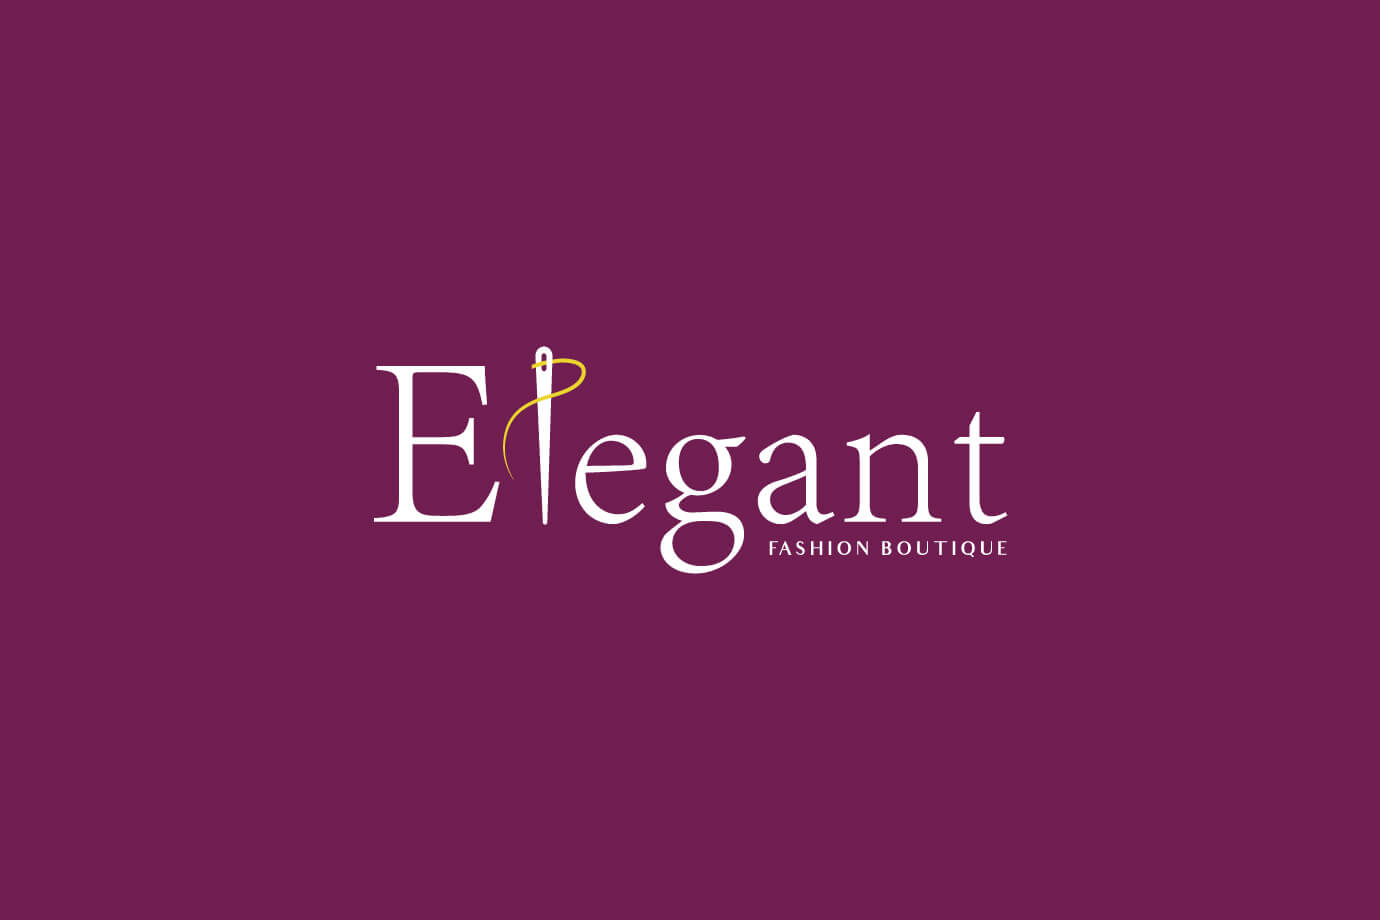 Elegant fashion Logo design By Freelance logo designer Sajid Sulaiman